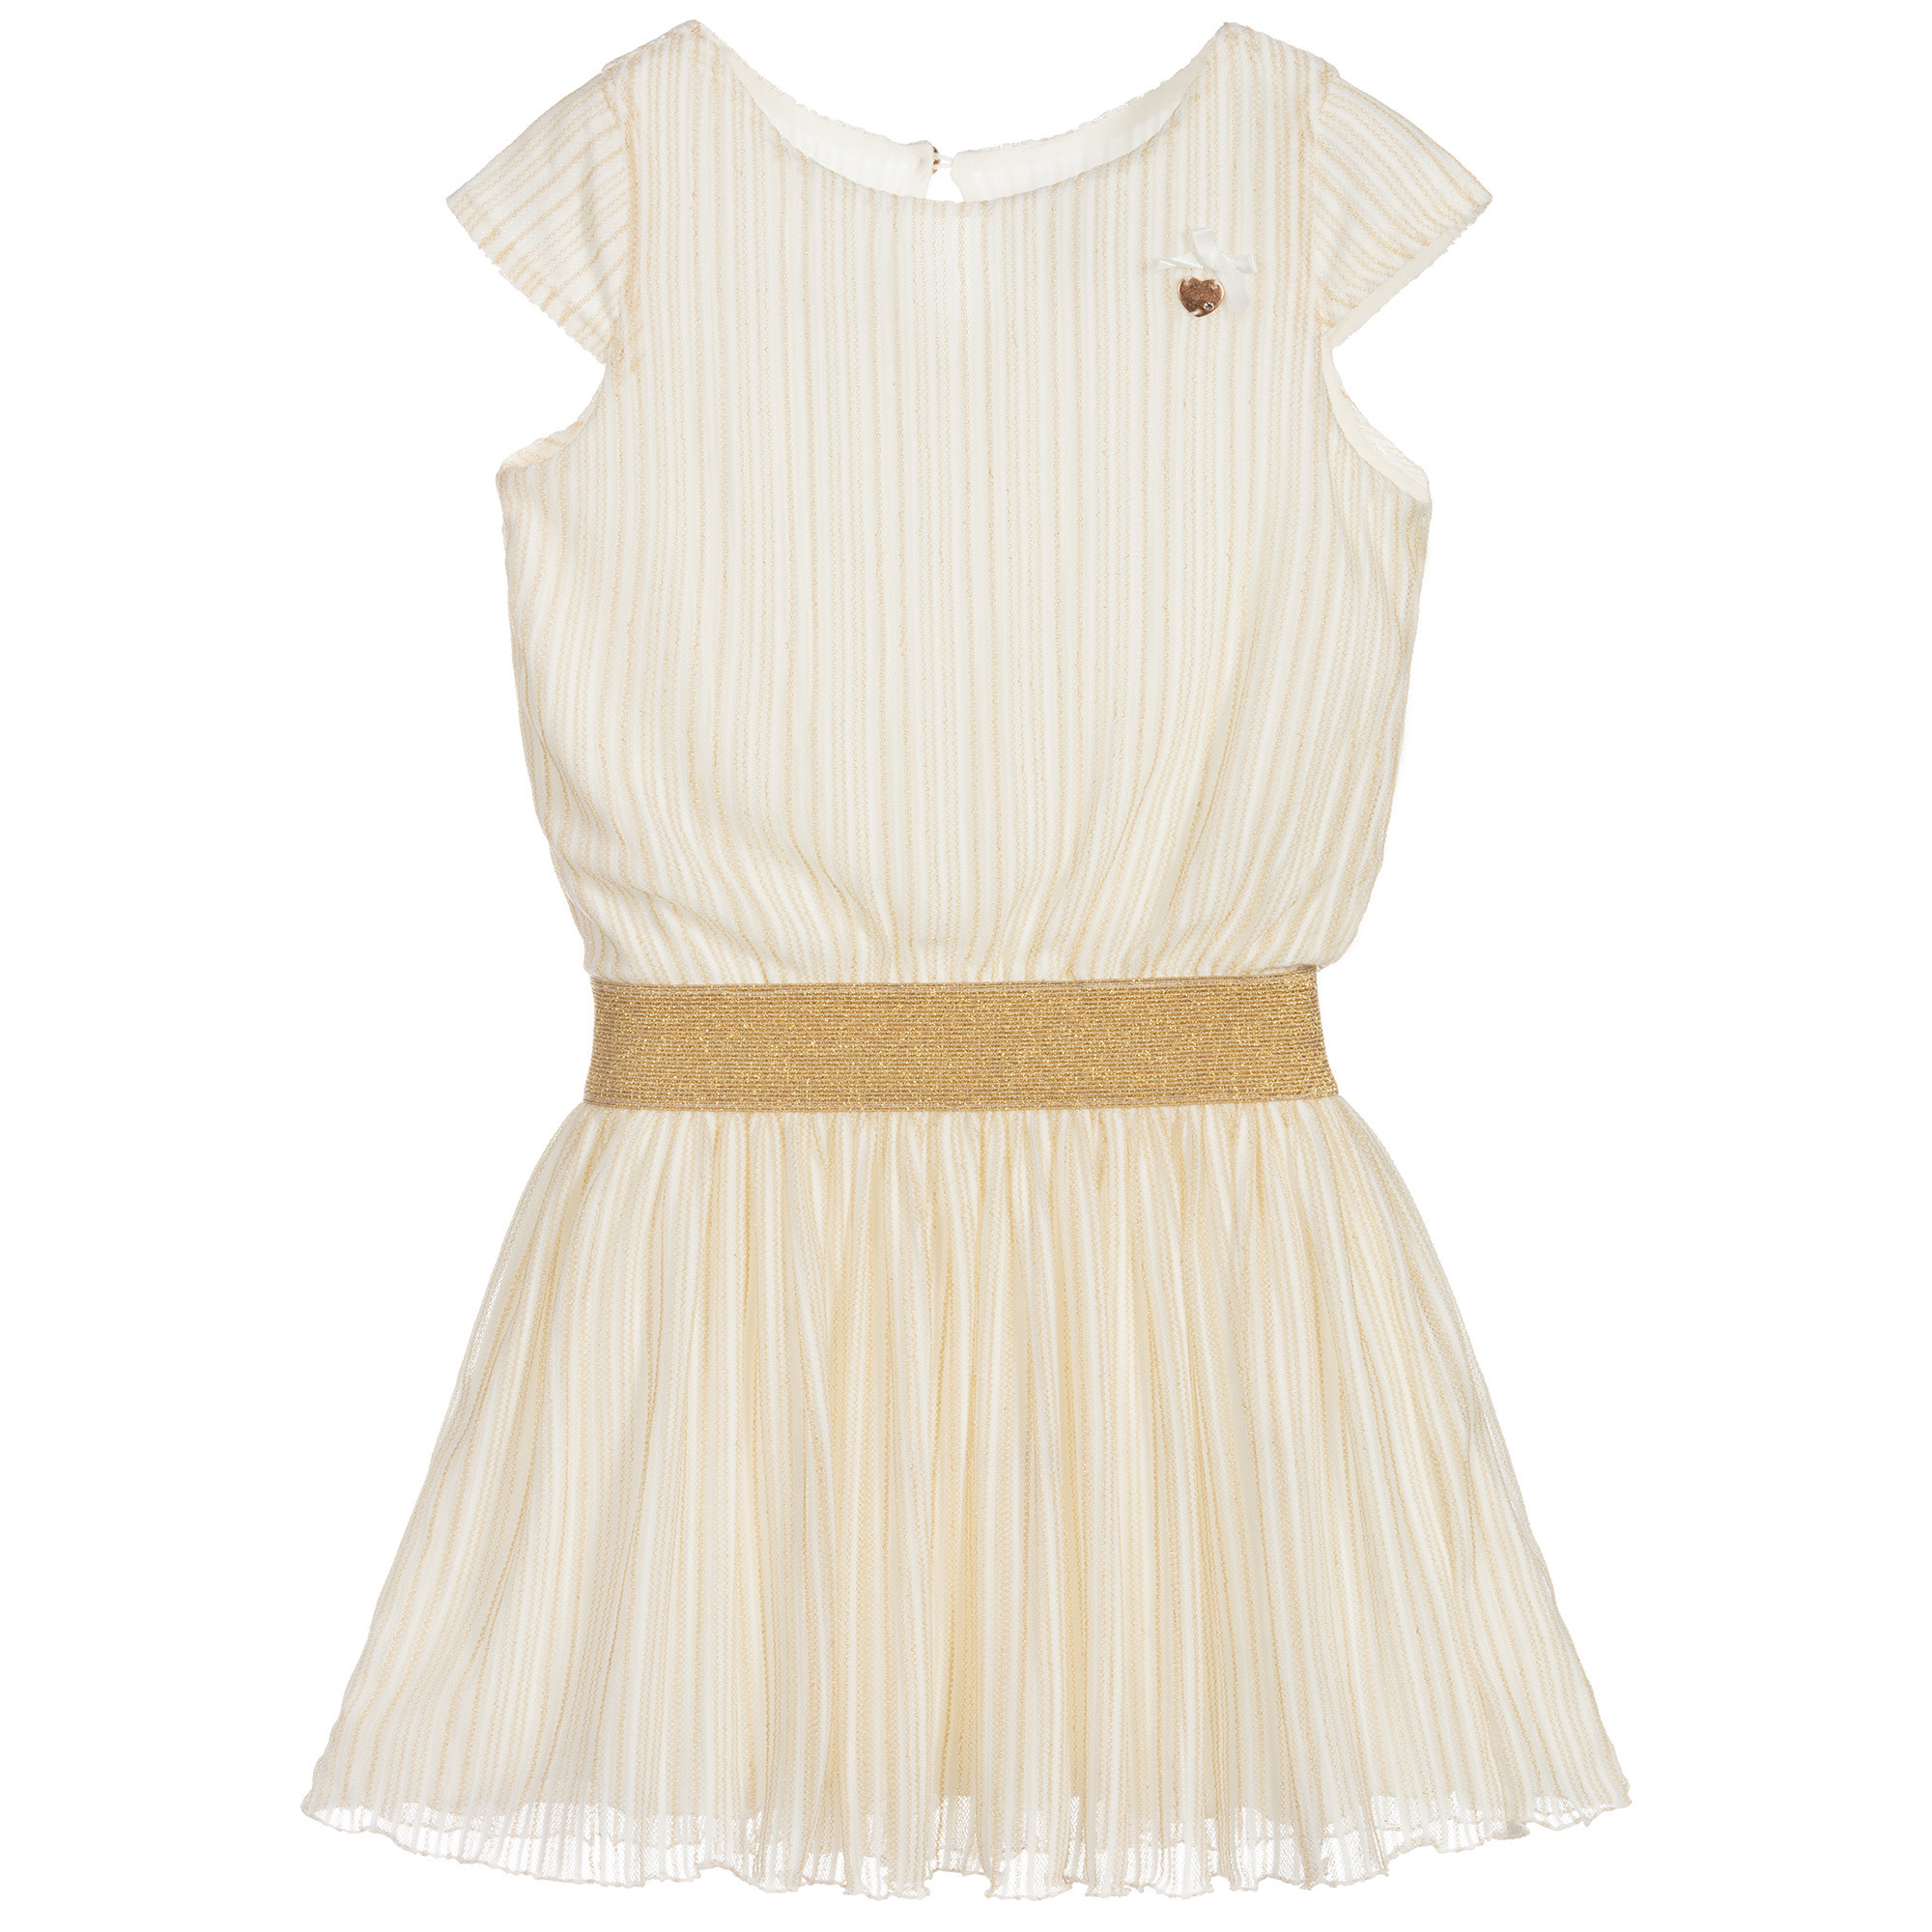 Lechic LeChic Golden Stripe Dress 5820